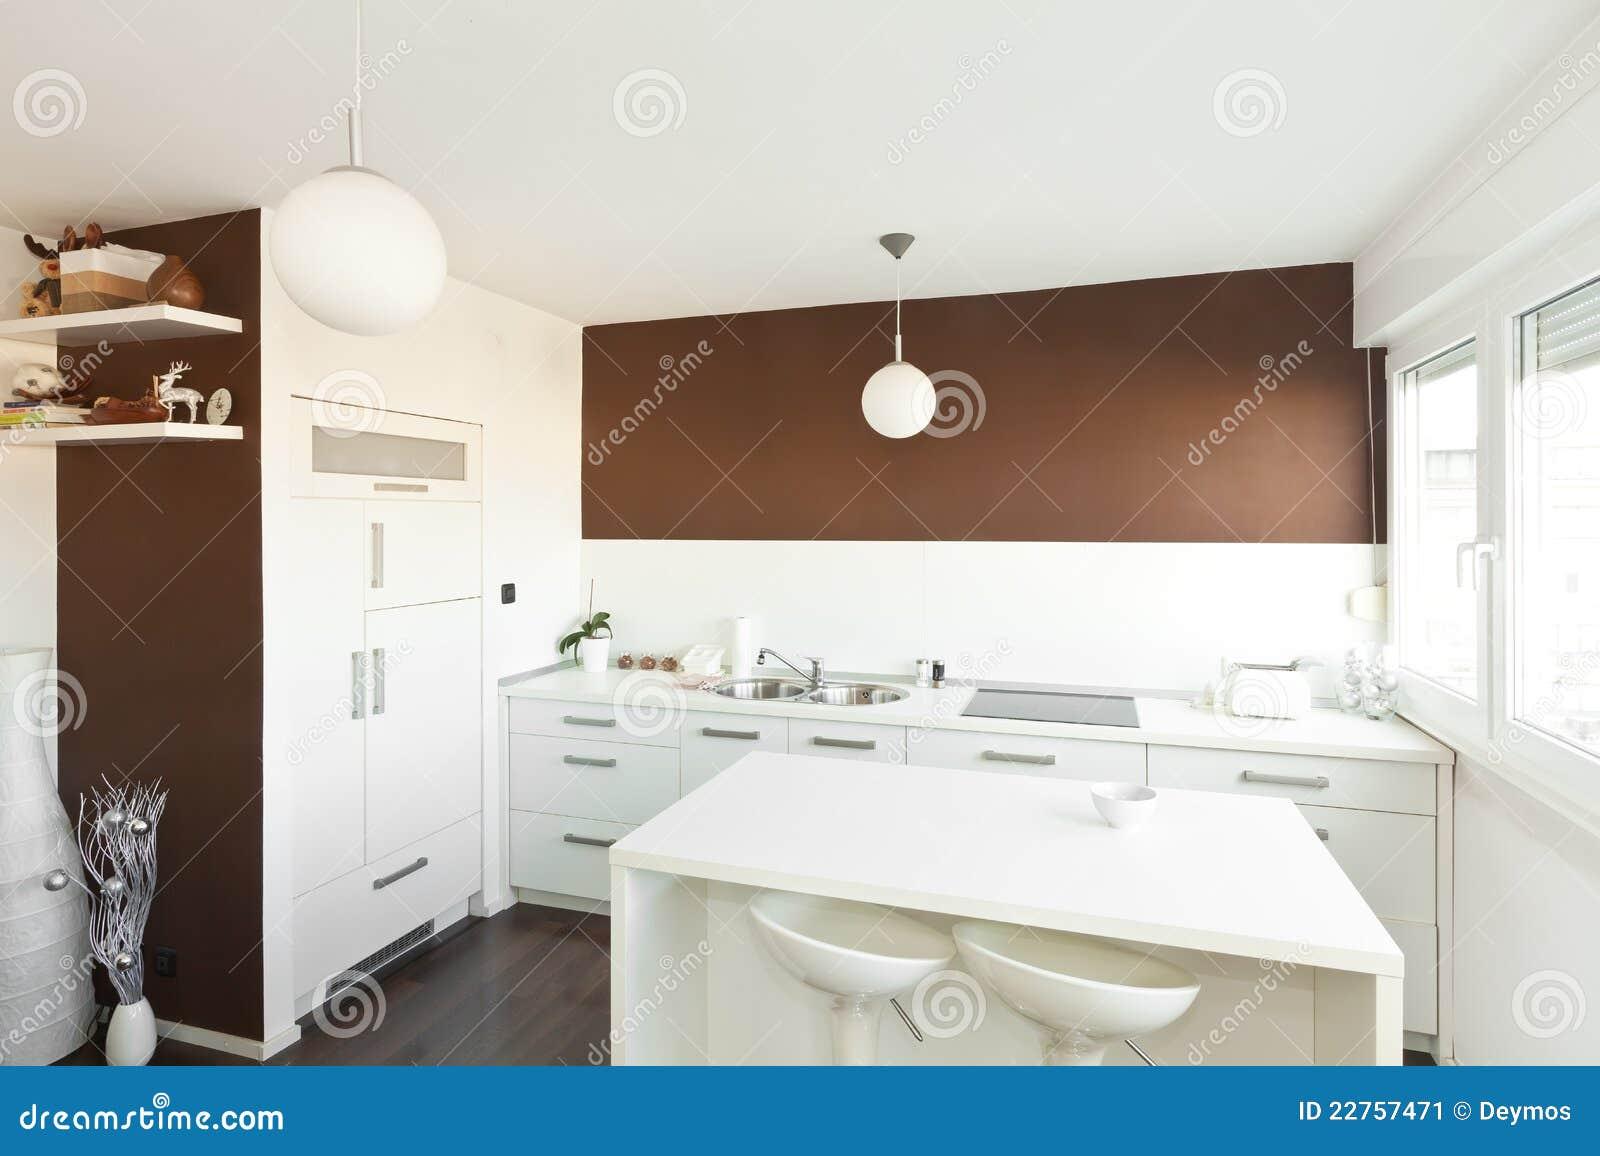 Awesome decorare pareti cucina ideas - Decorazioni pareti cucina ...